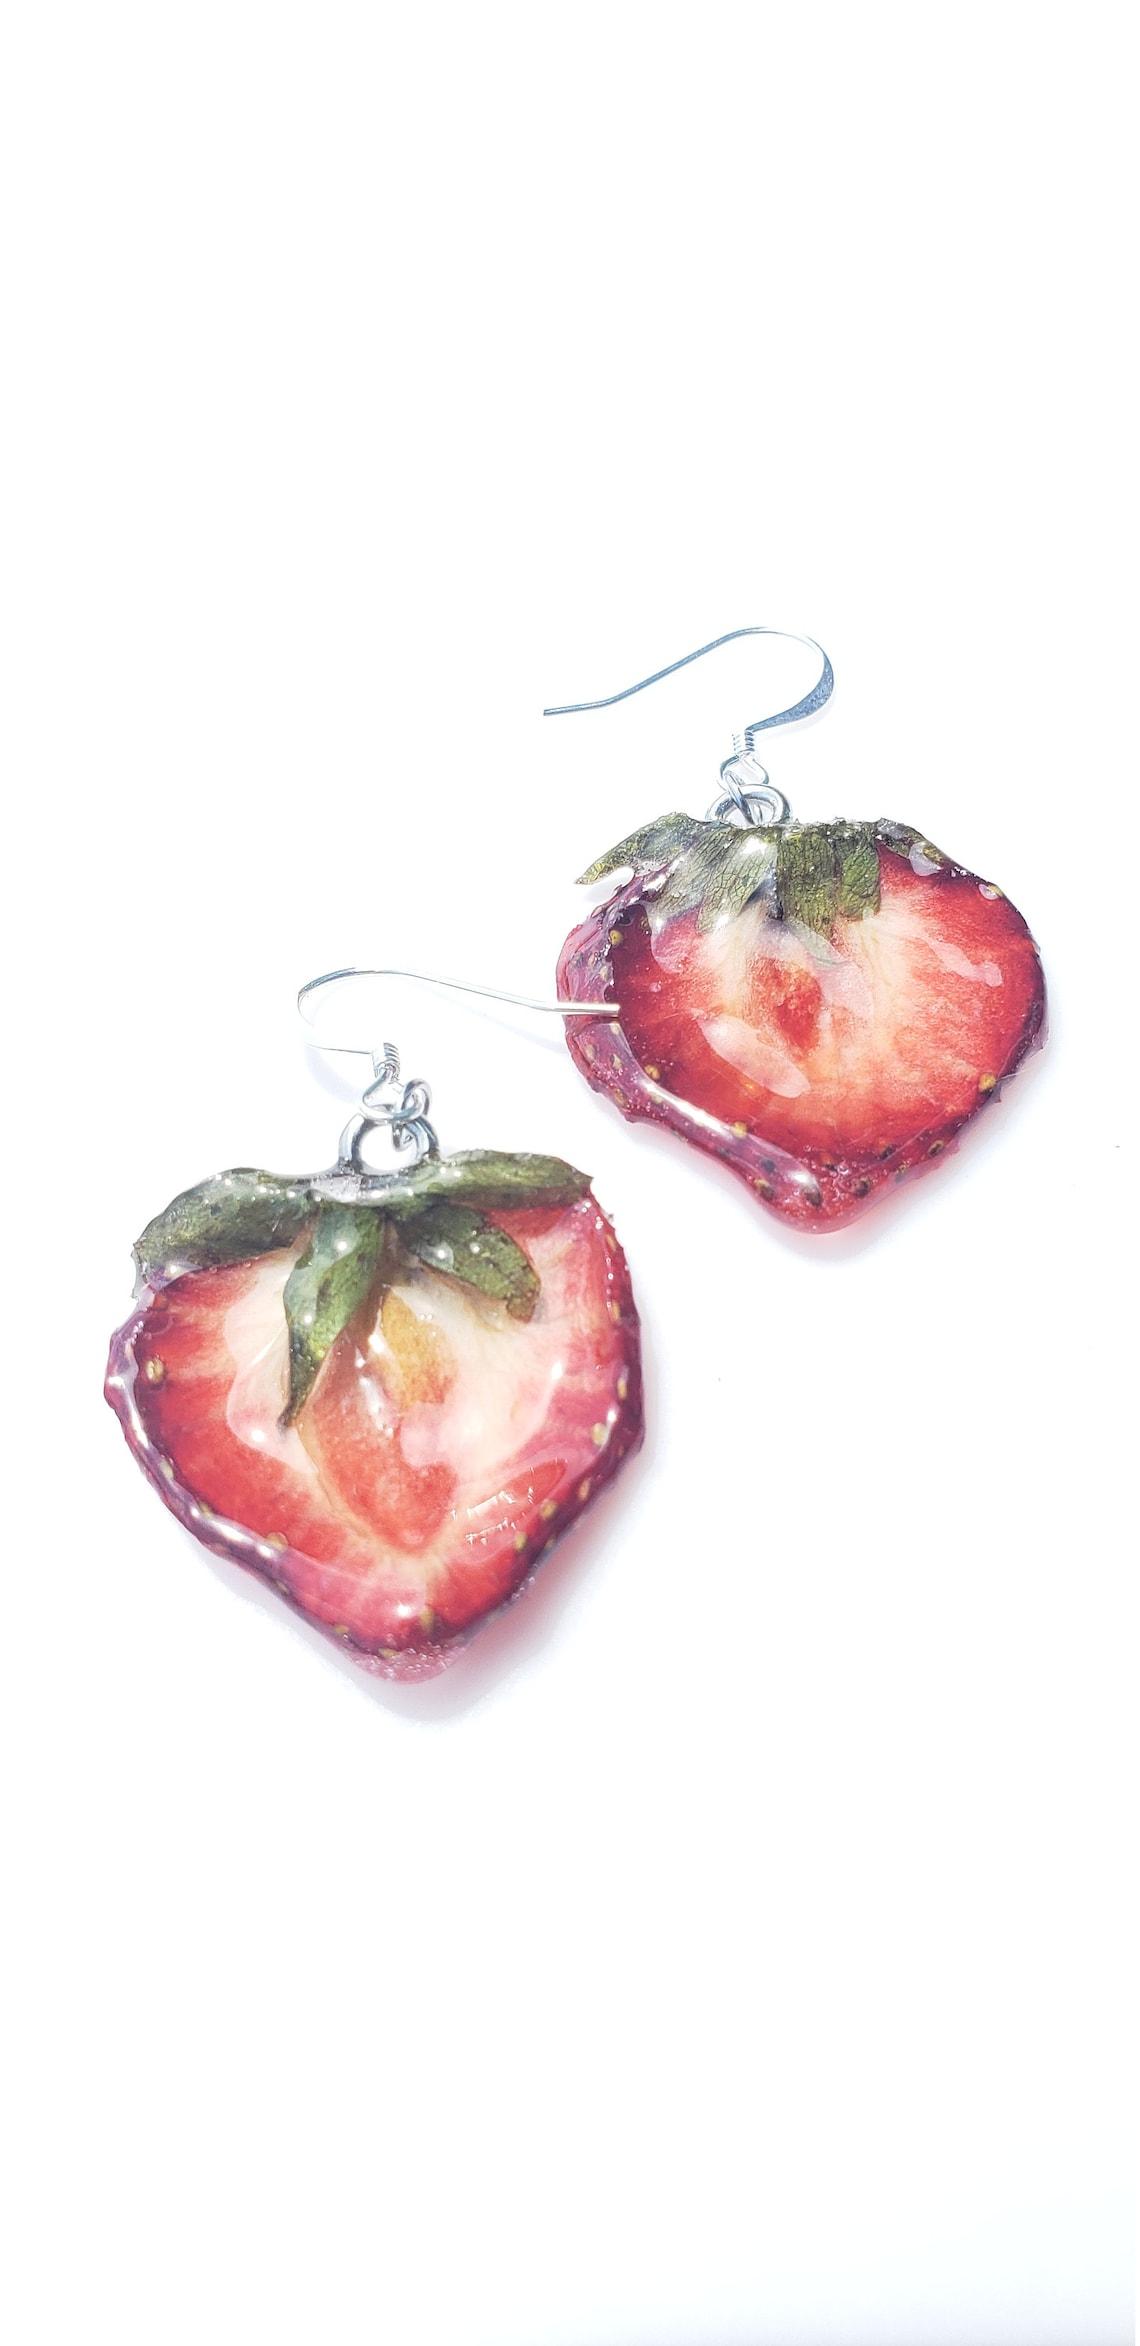 Strawberry Earrings XS real fruit jewelry fruit jewelry image 0